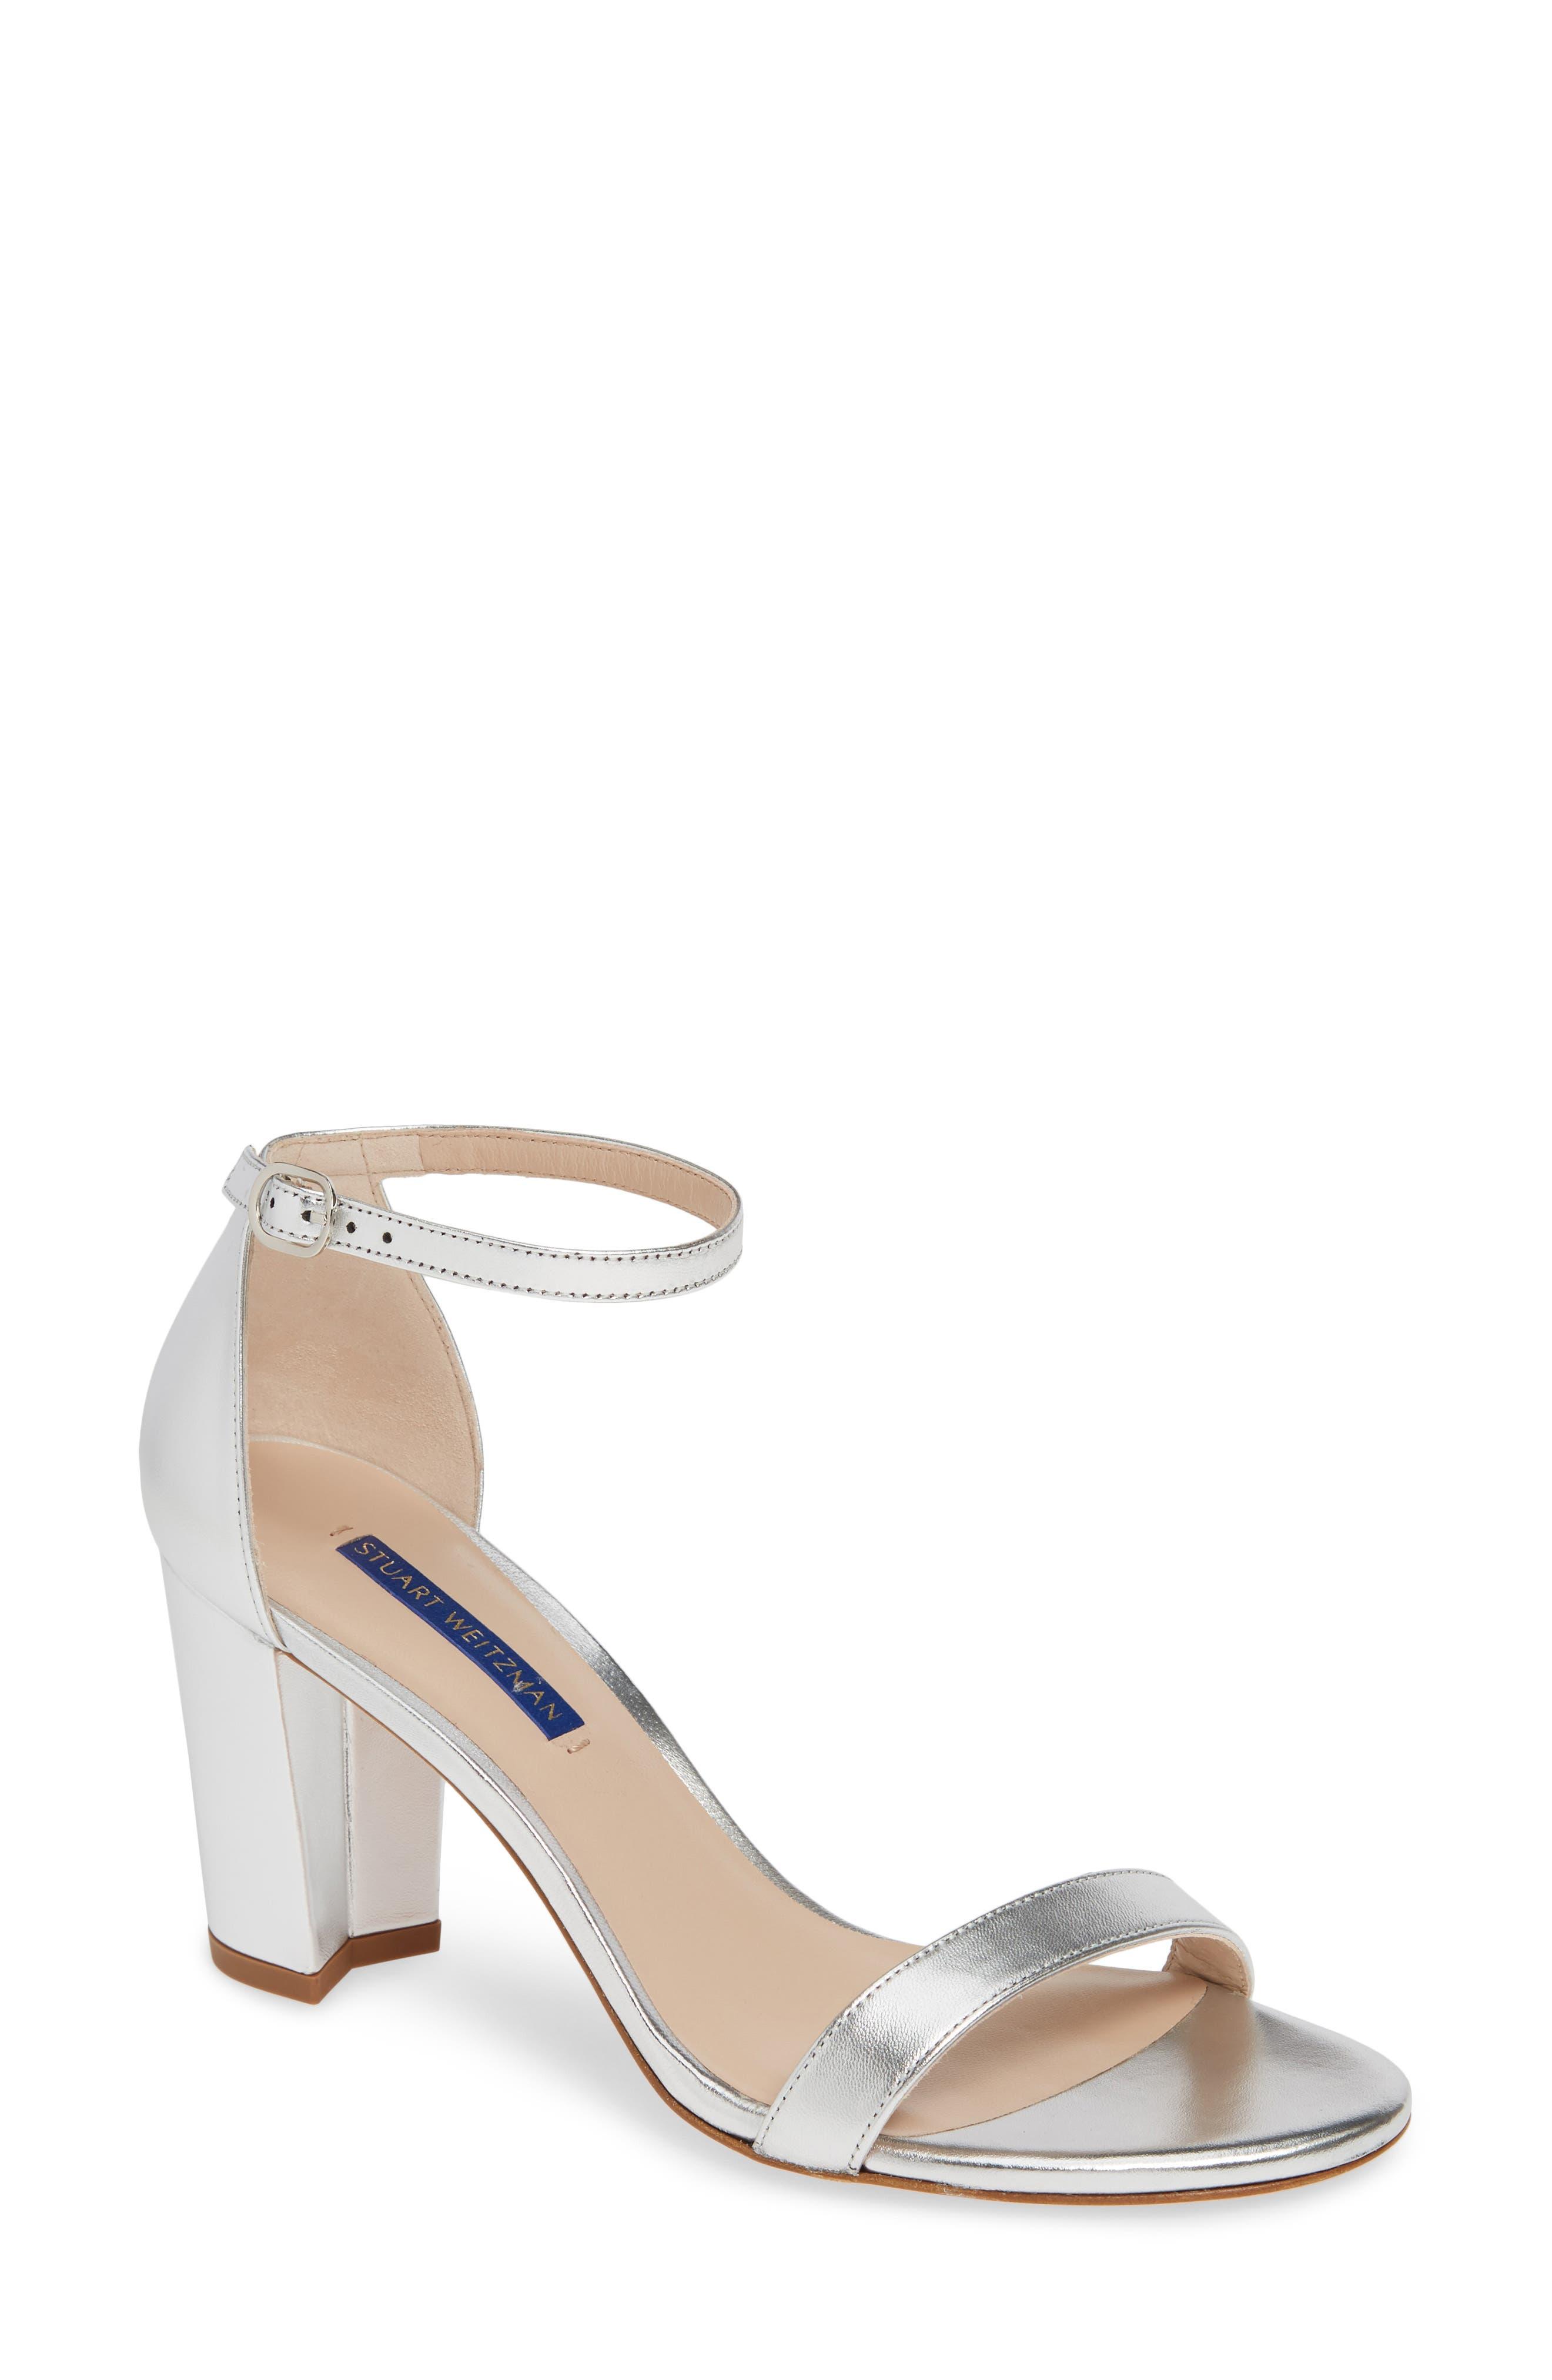 STUART WEITZMAN,                             NearlyNude Ankle Strap Sandal,                             Main thumbnail 1, color,                             SILVER METALLIC NAPPA